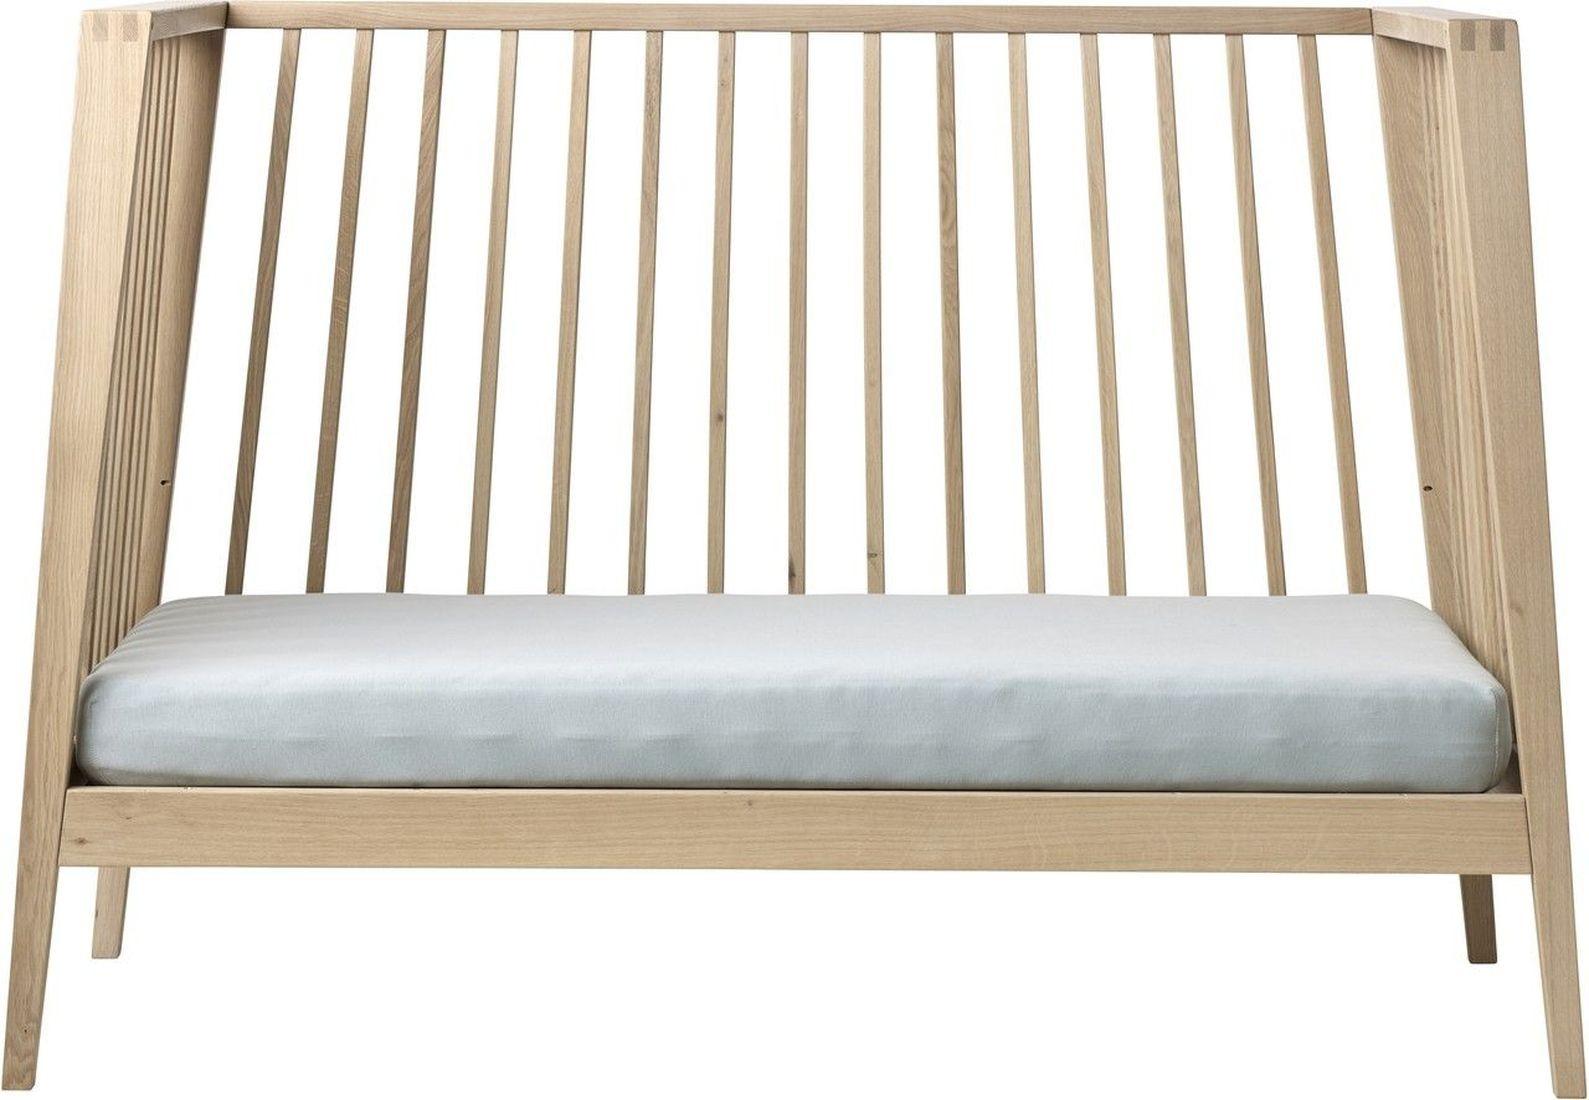 Kinderbett skandinavisches design wohn design - Designer babybett ...